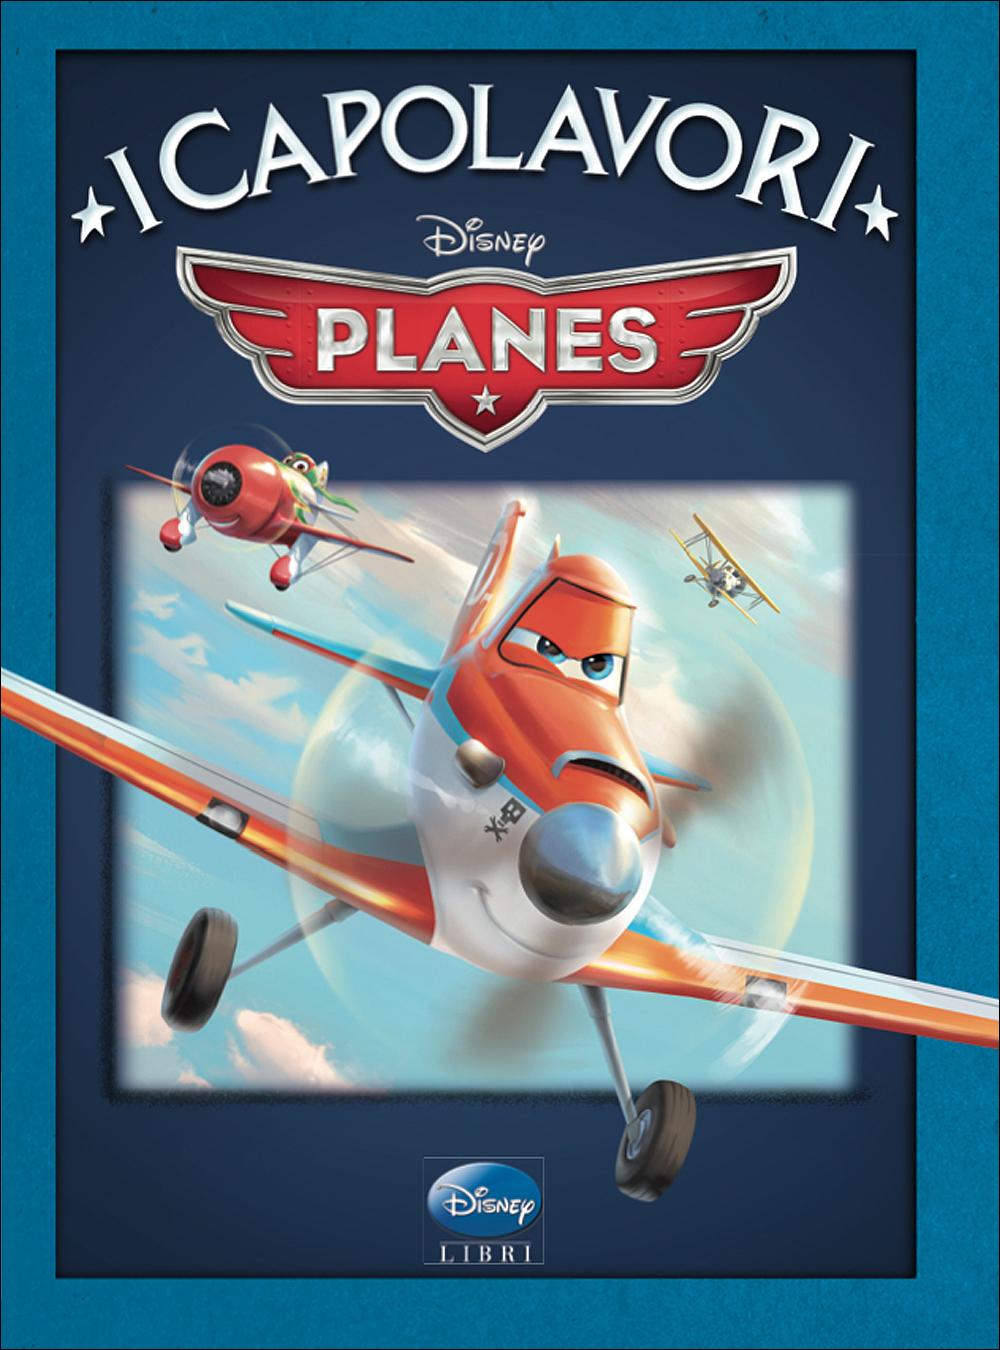 Planes - I Capolavori